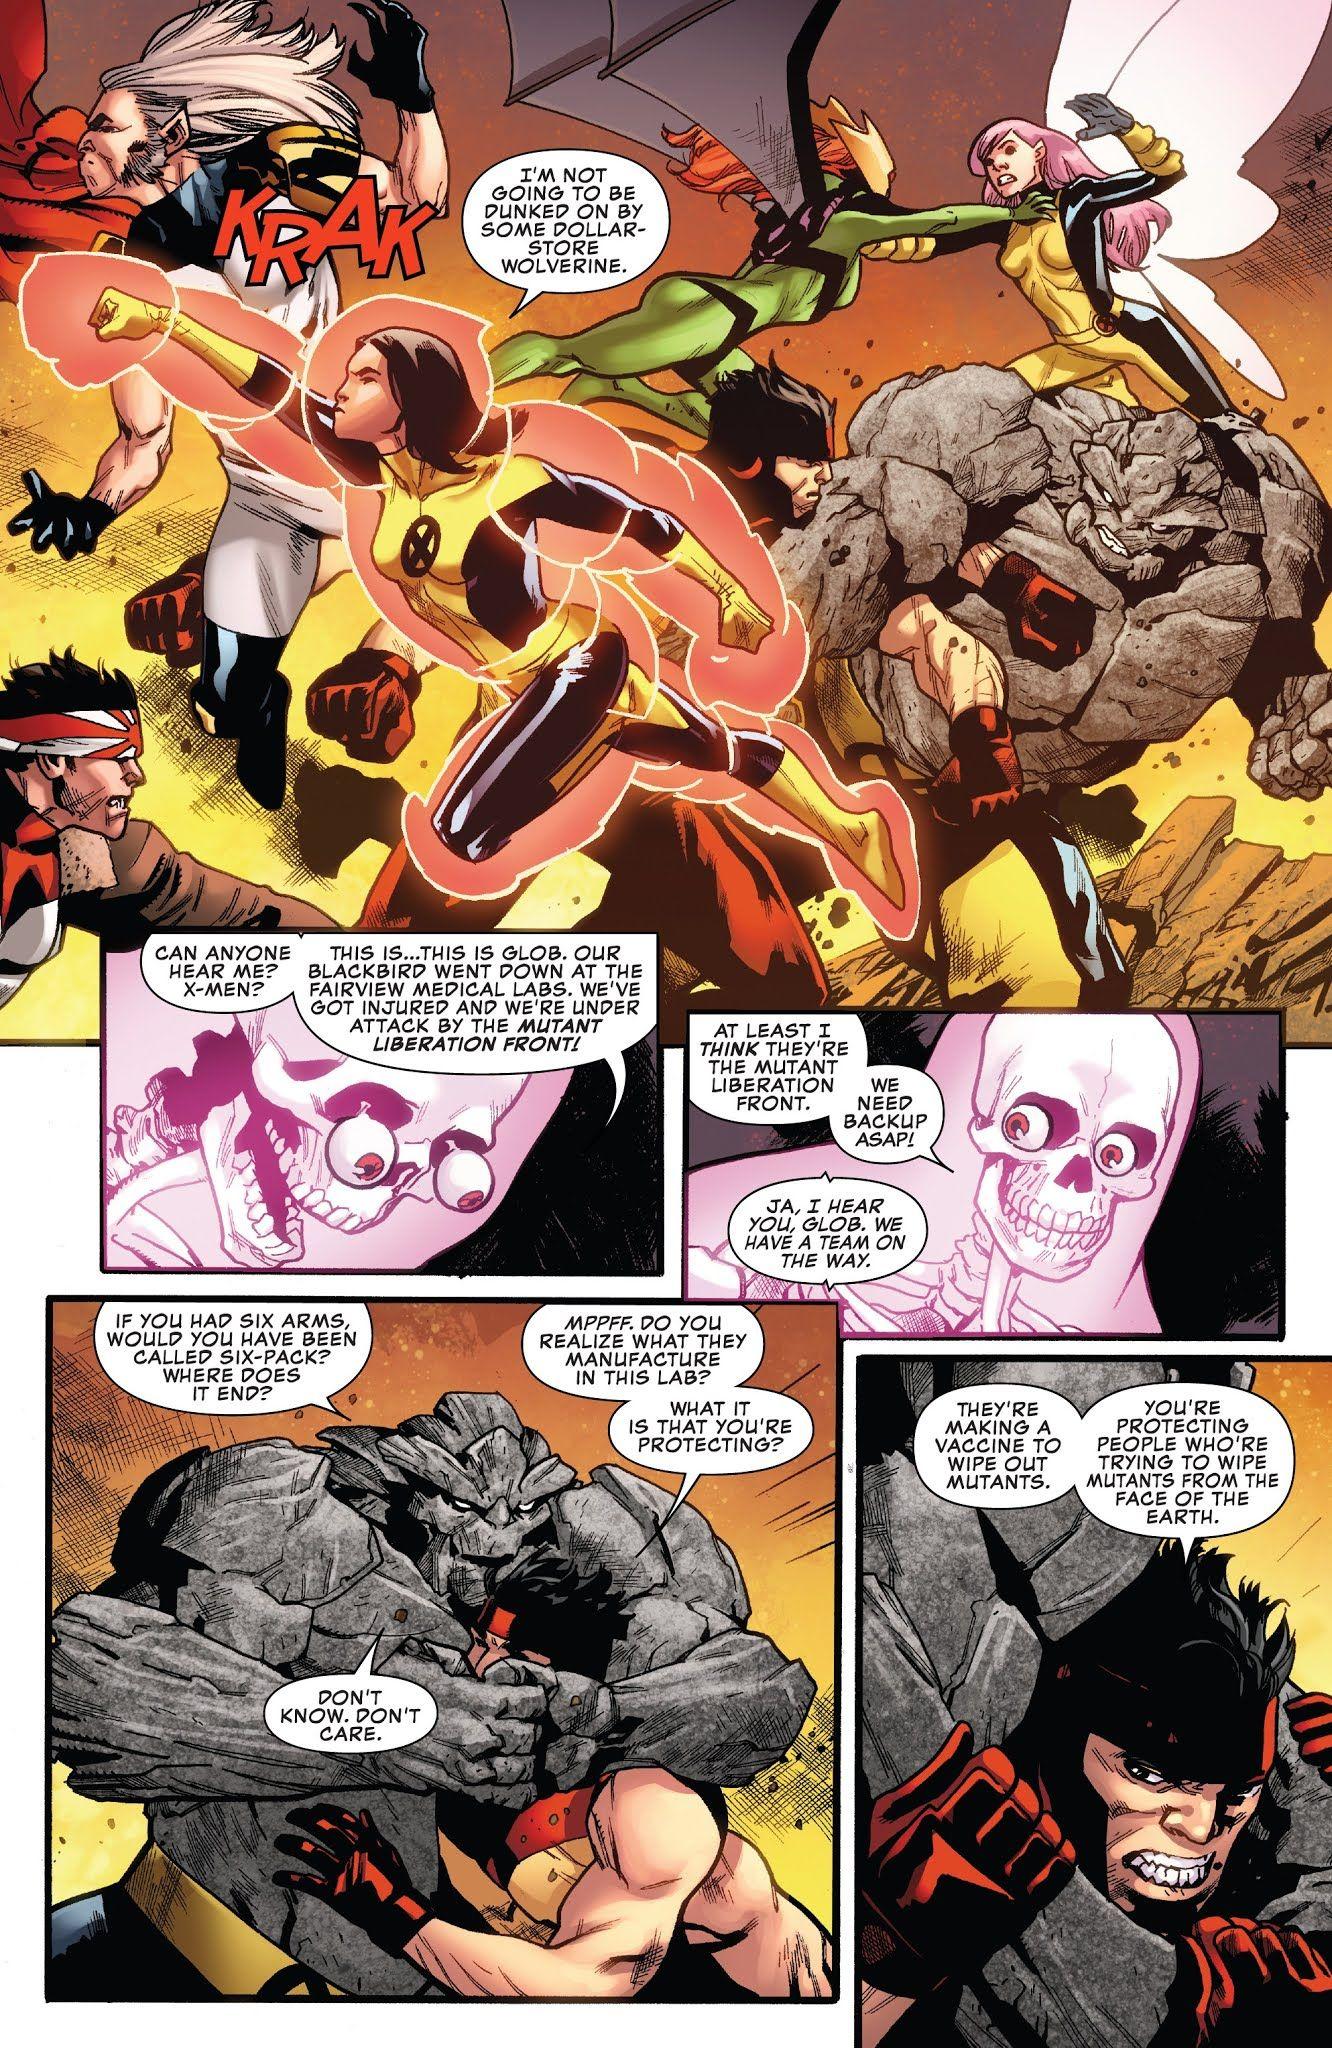 Uncanny X Men 2019 Issue 1 Read Uncanny X Men 2019 Issue 1 Comic Online In High Quality X Men Comics Comics Online